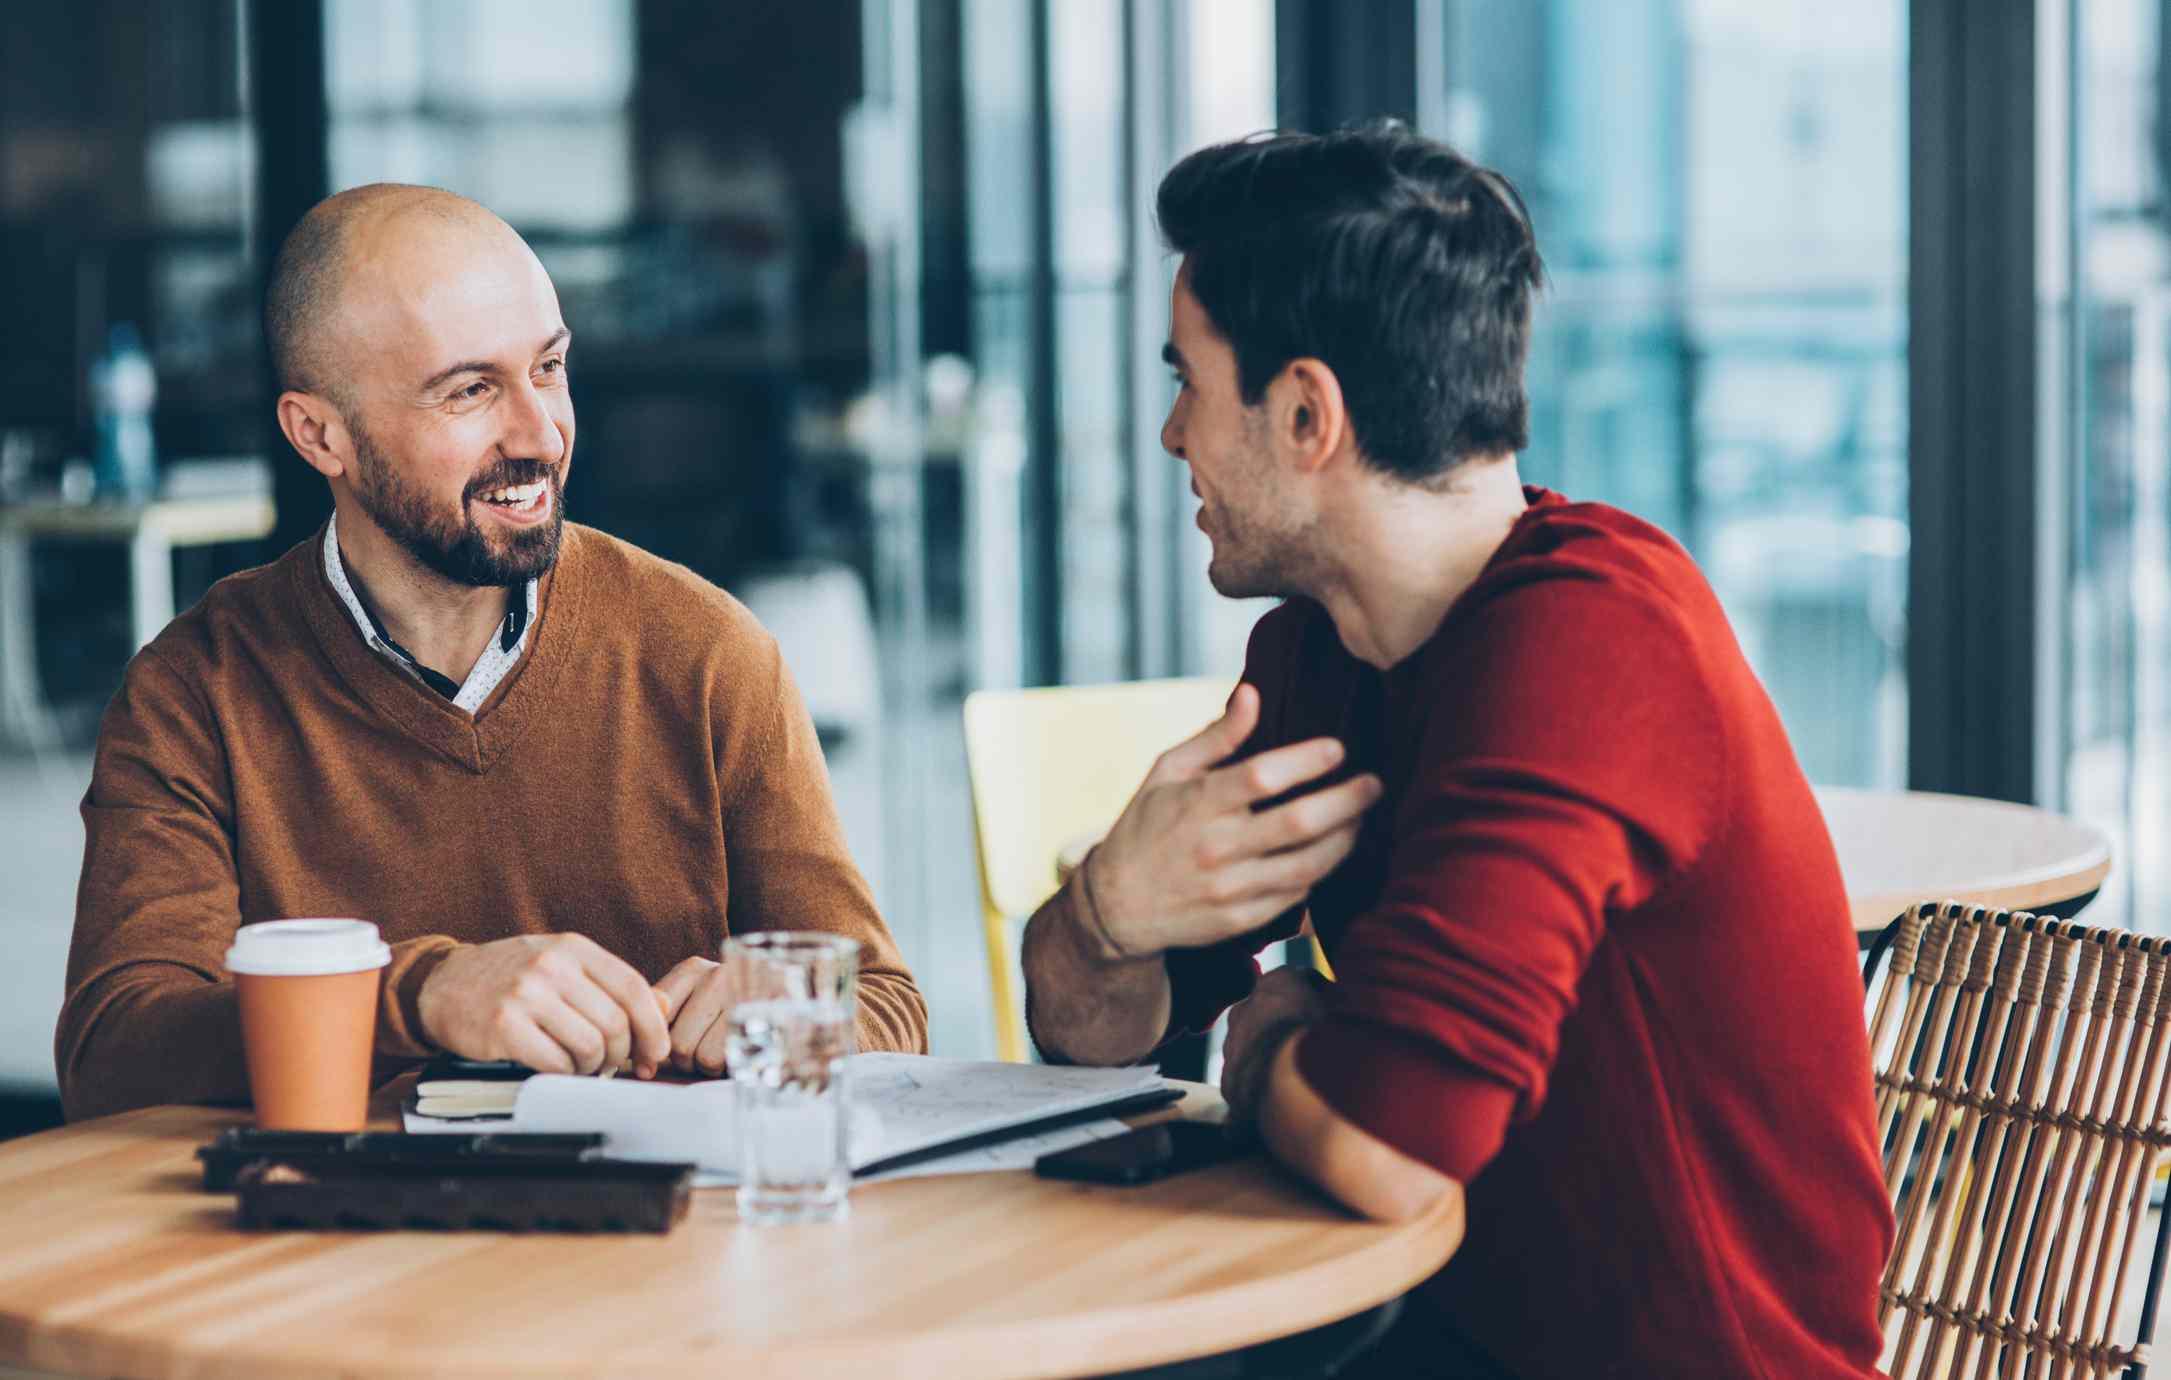 Meeting at cafe